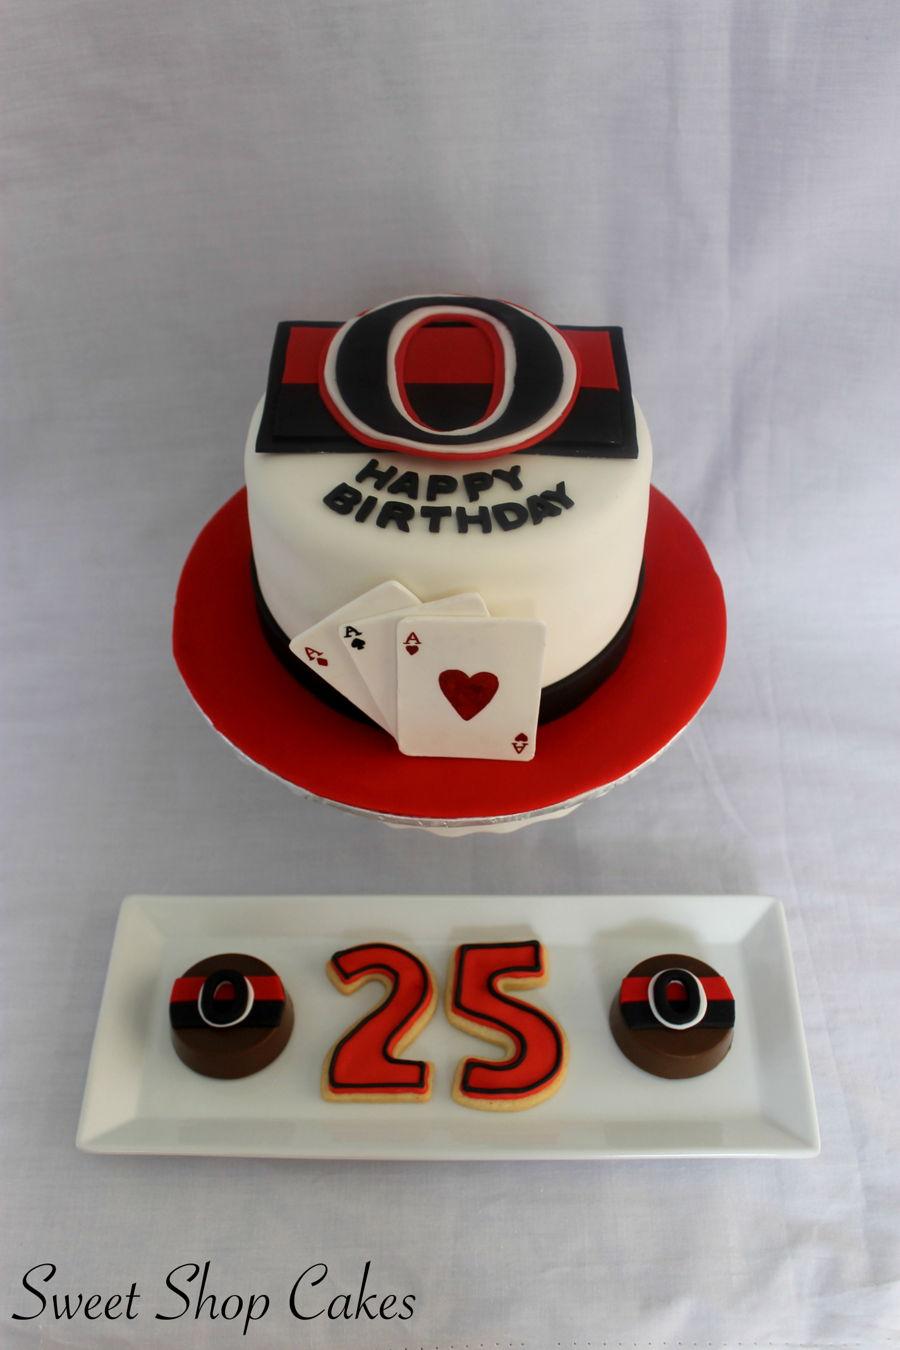 900_hockeycasino-themed-birthday-cake-937512L2HCl.jpg